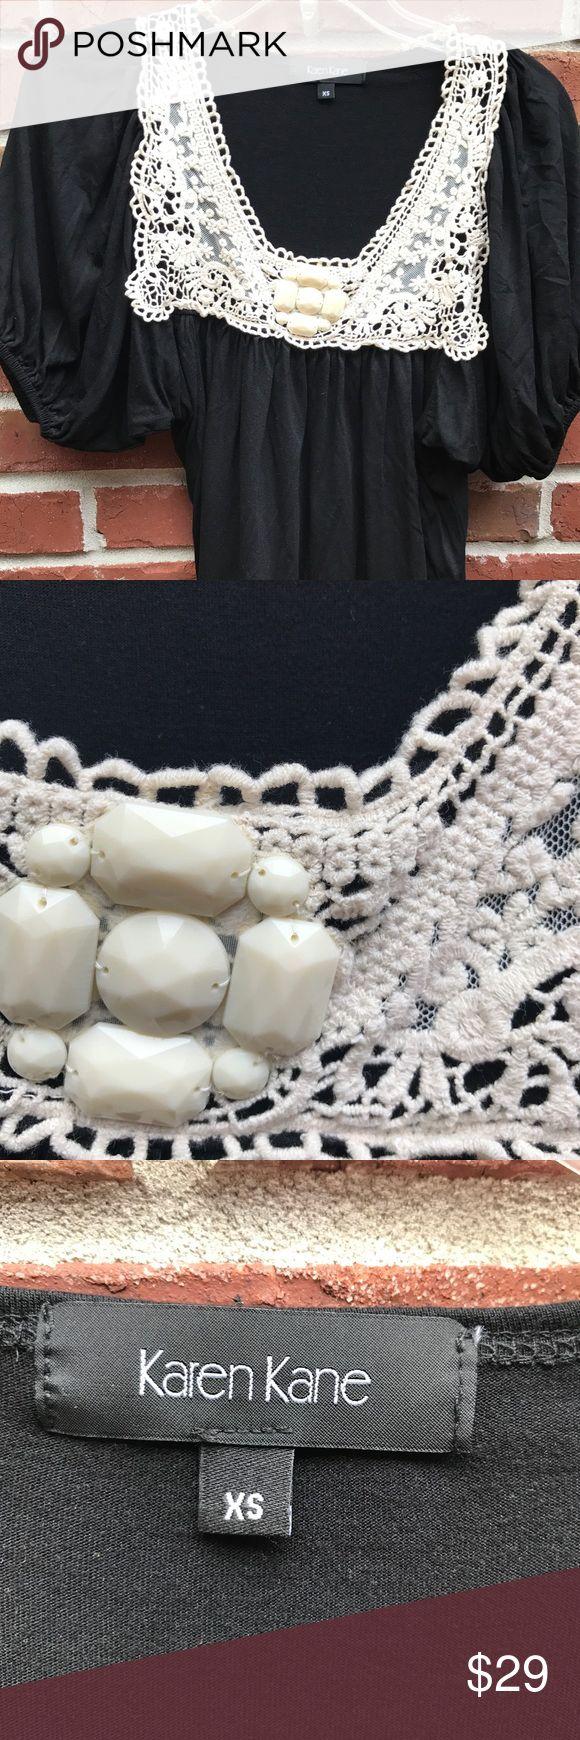 Karen Kane XS Black Knit Top with Ivory Lace Karen Kane XS Black Knit Top with Ivory Lace. Excellent condition. Karen Kane Tops Blouses